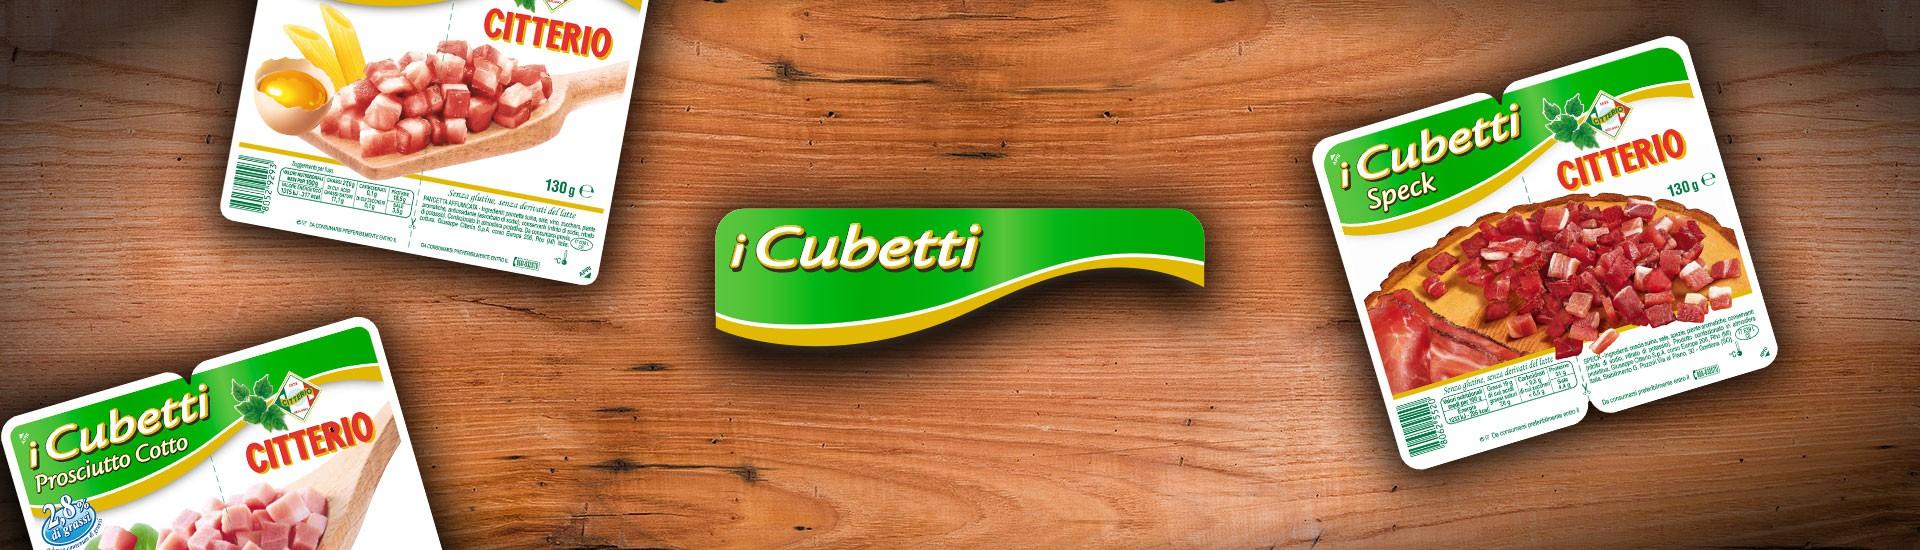 cover-cubetti6BYjUL.jpg